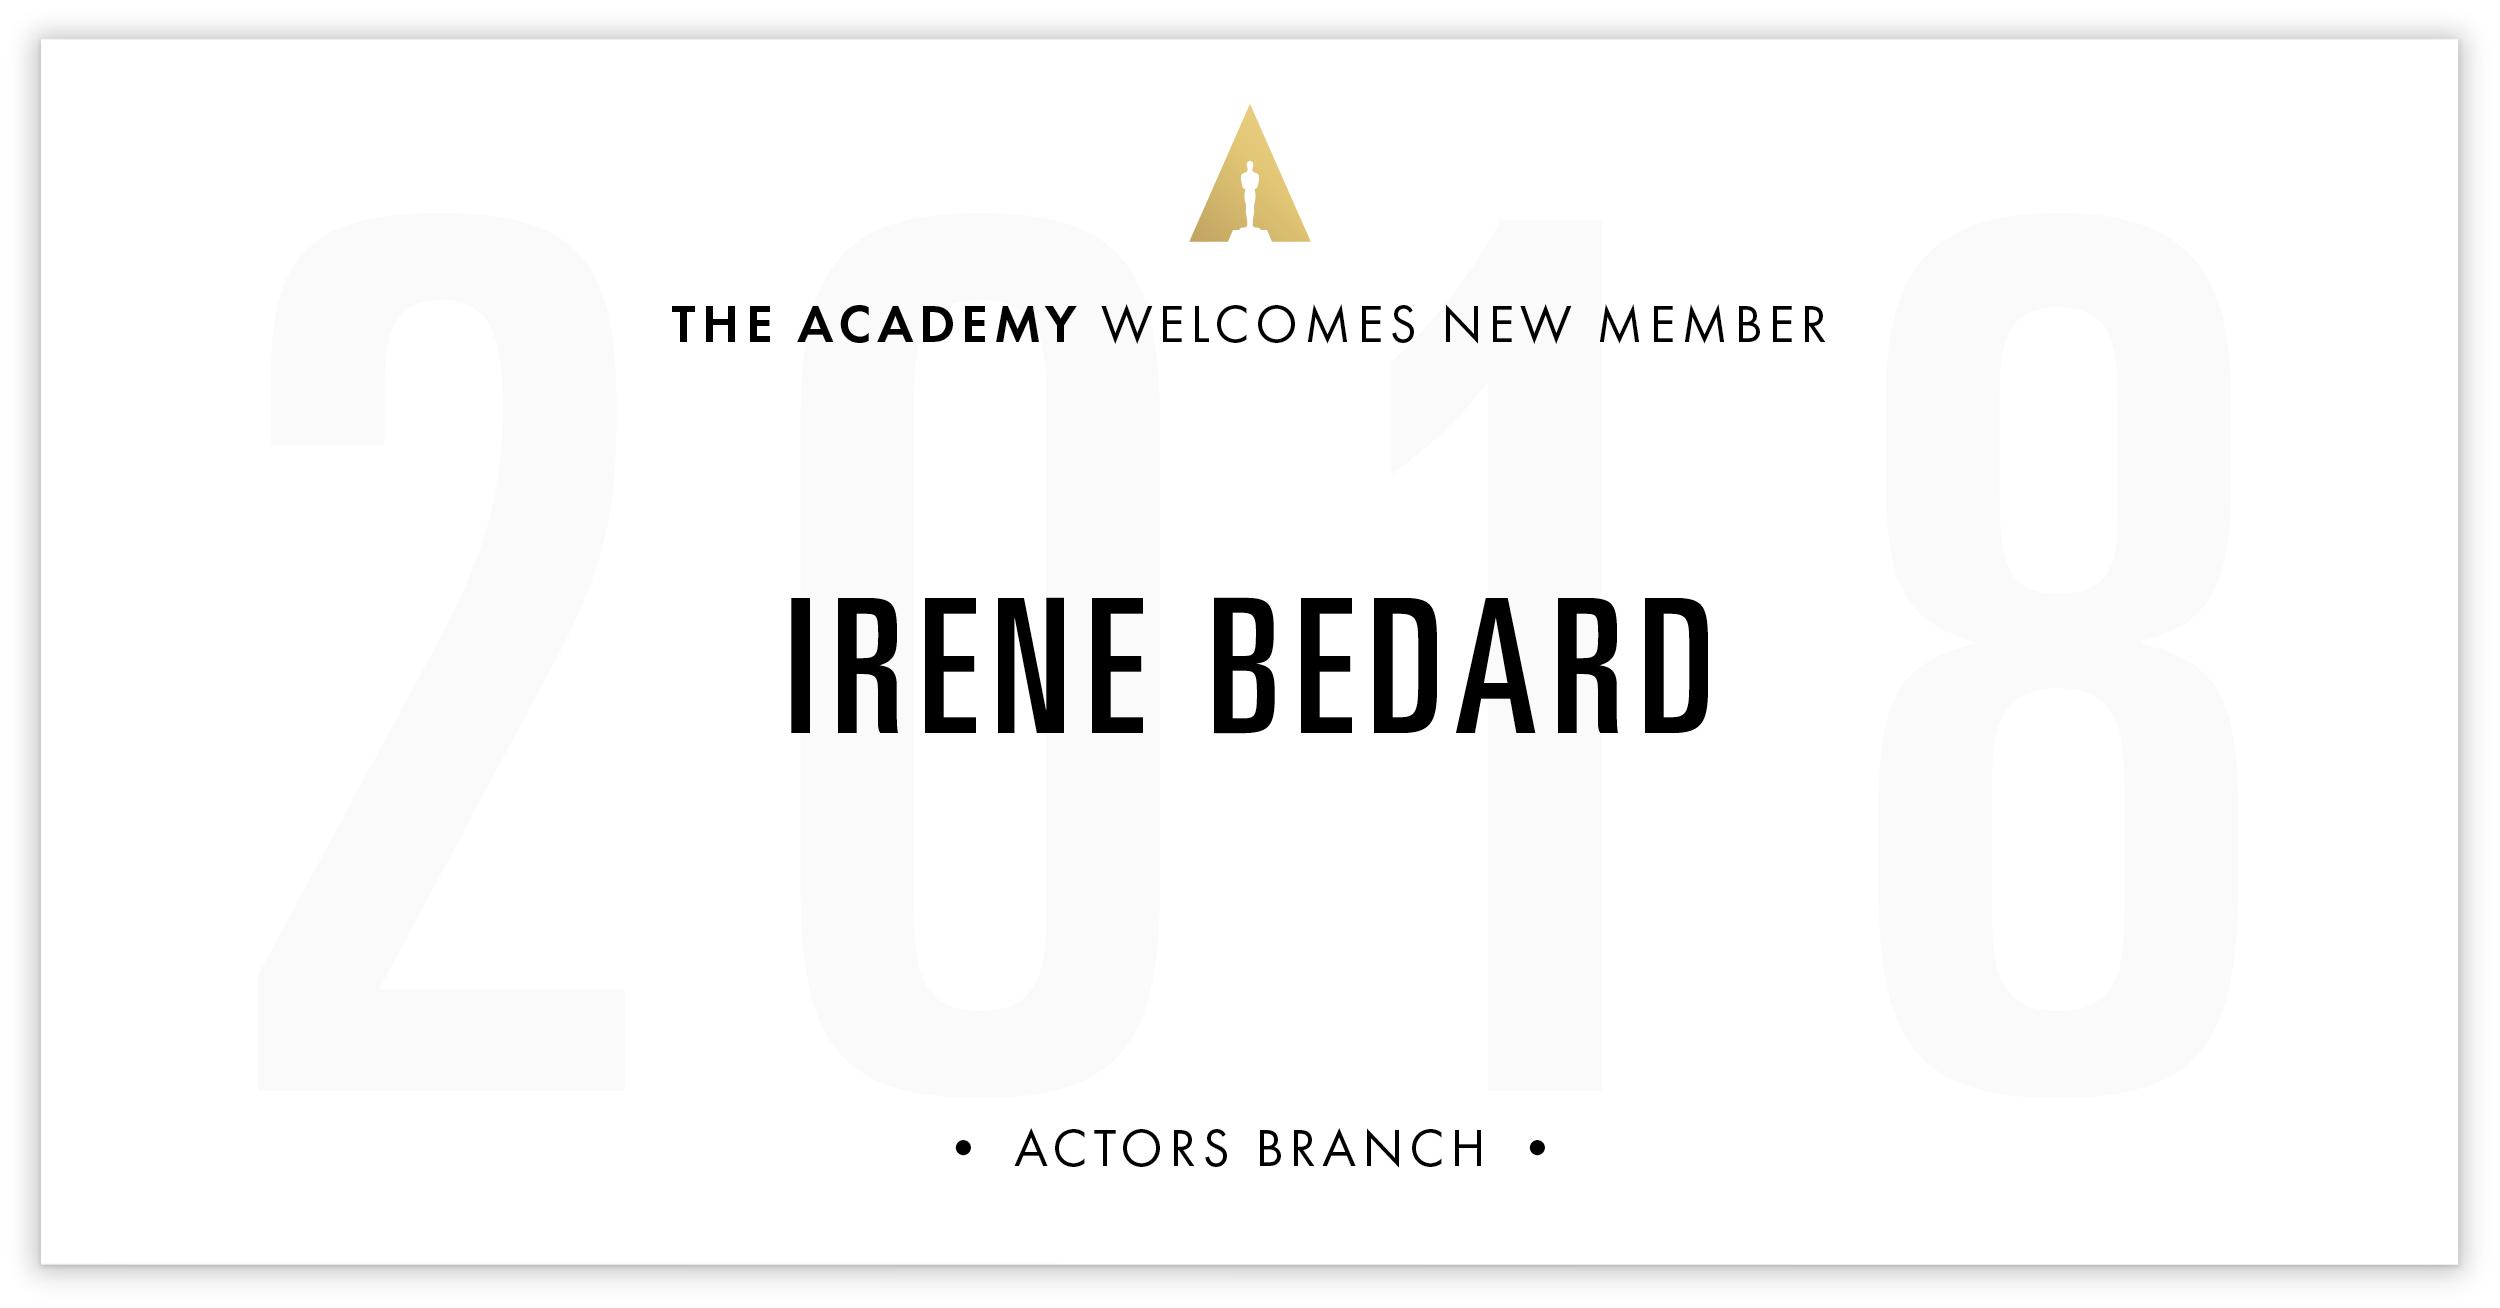 Irene Bedard is invited!